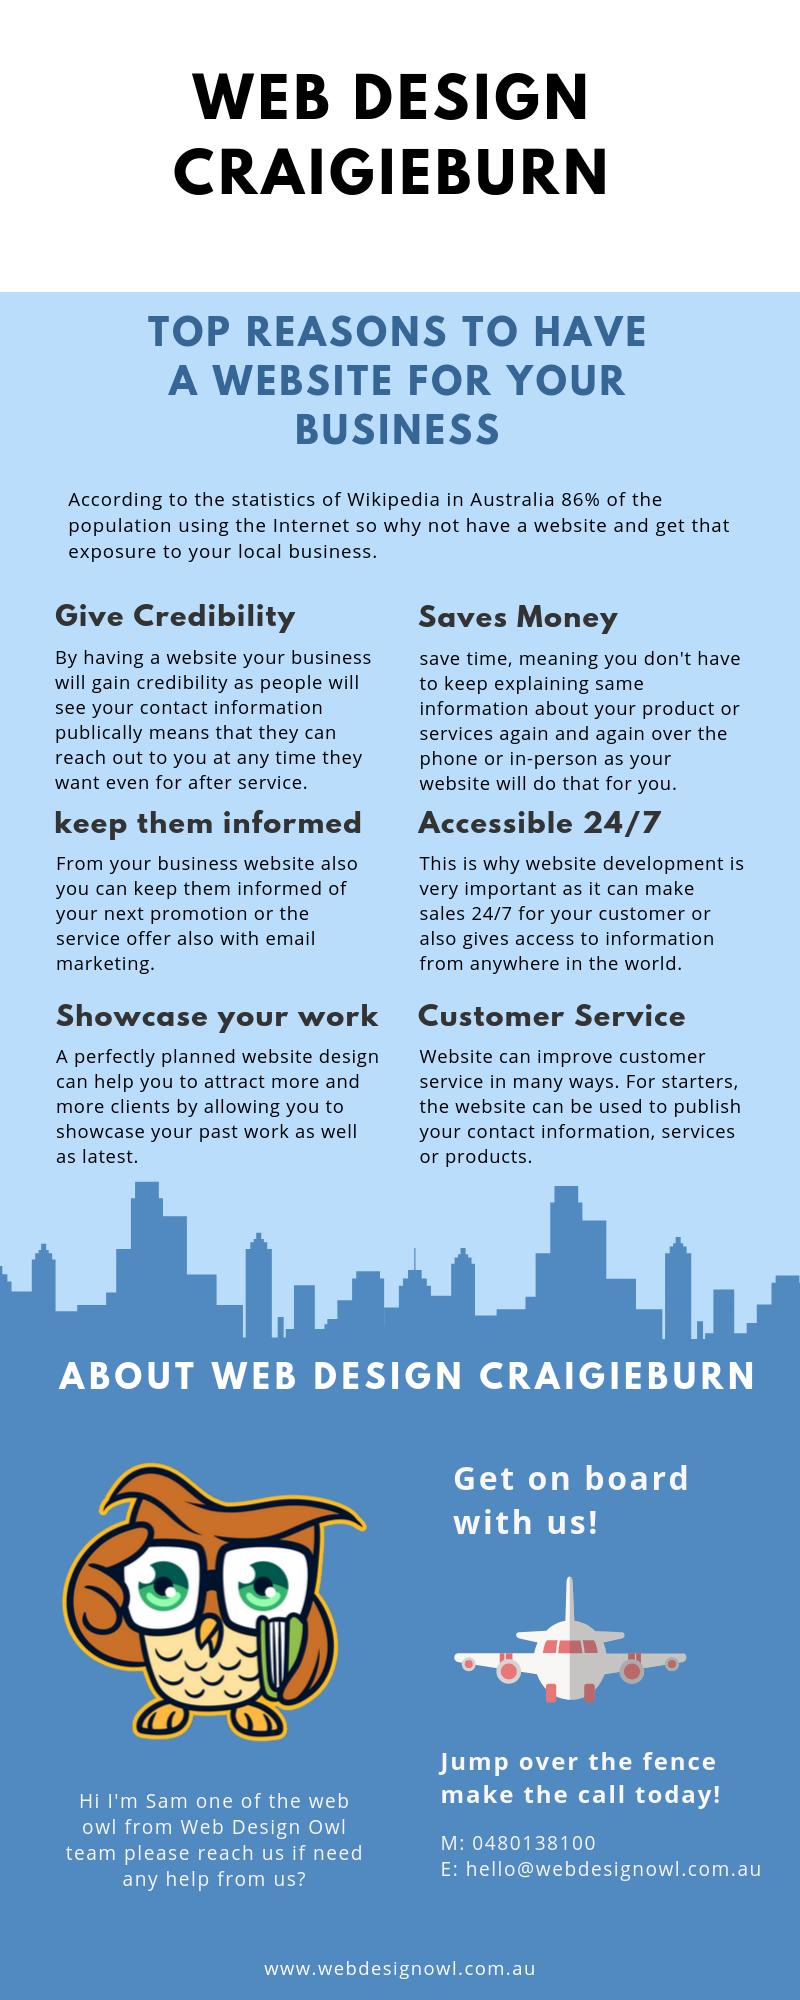 Web design Craigieburn for business dummies.